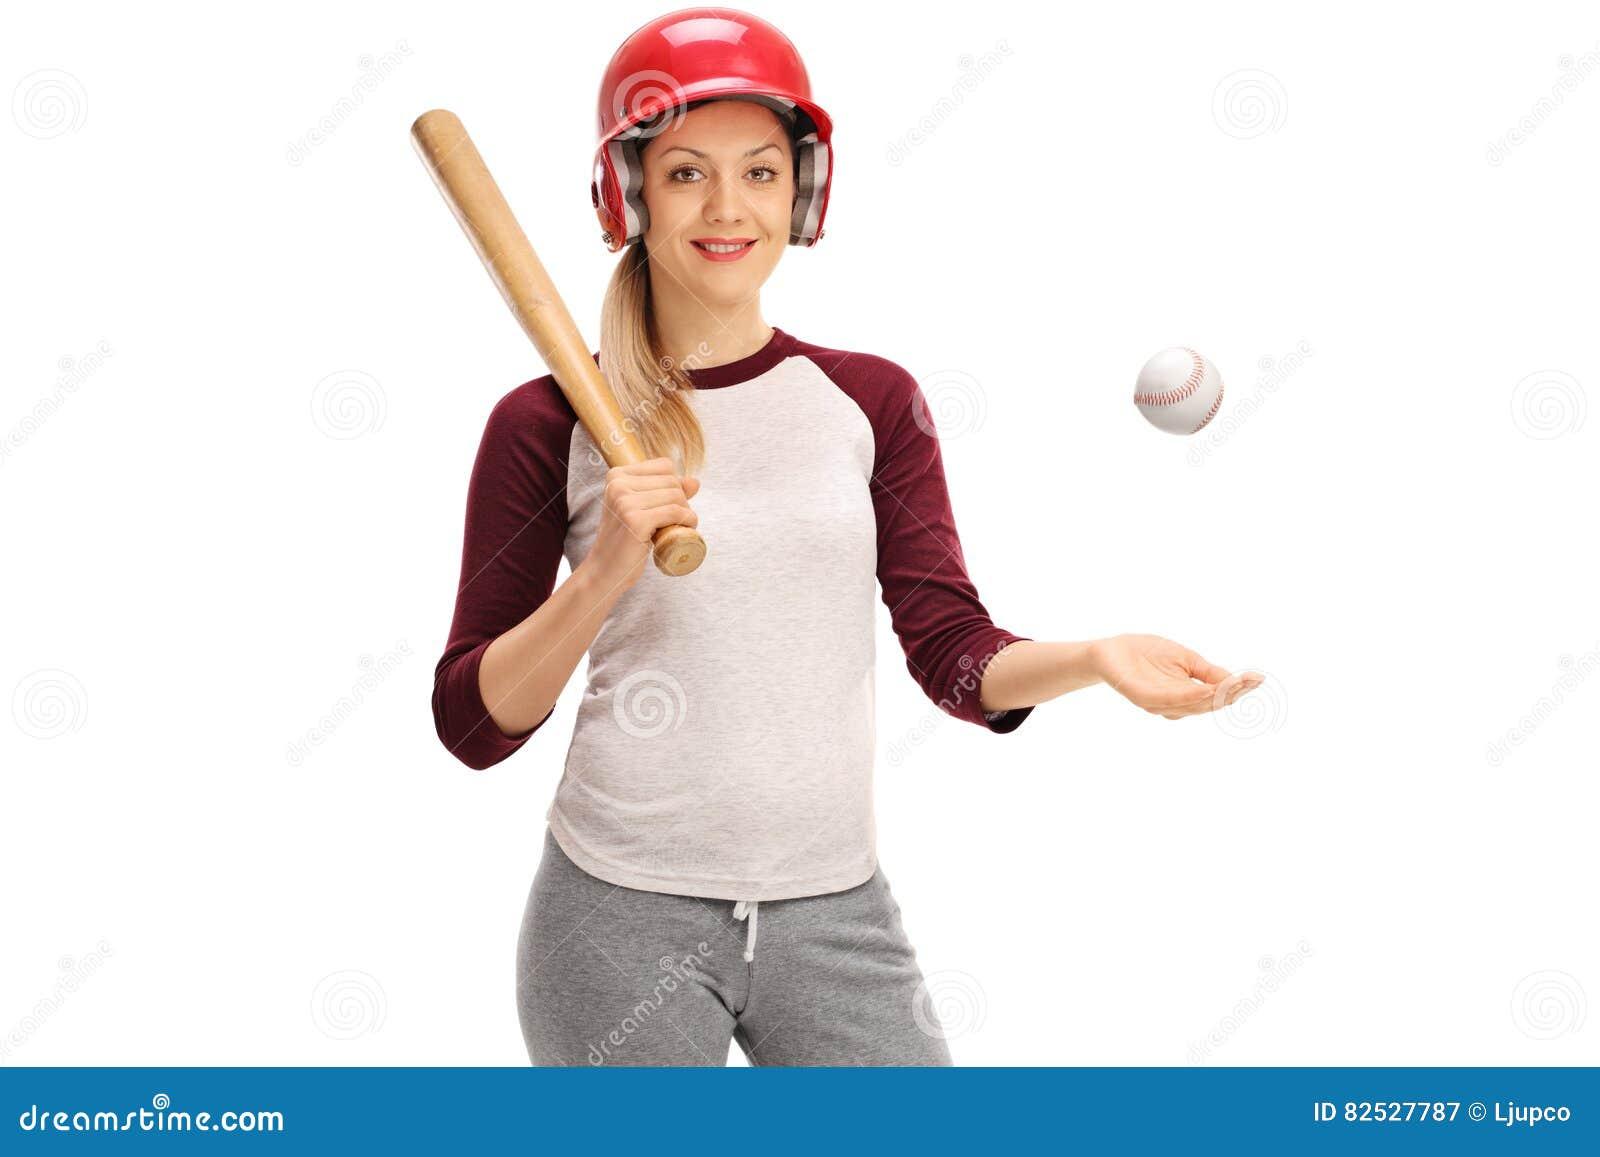 Women fucking baseball bats images